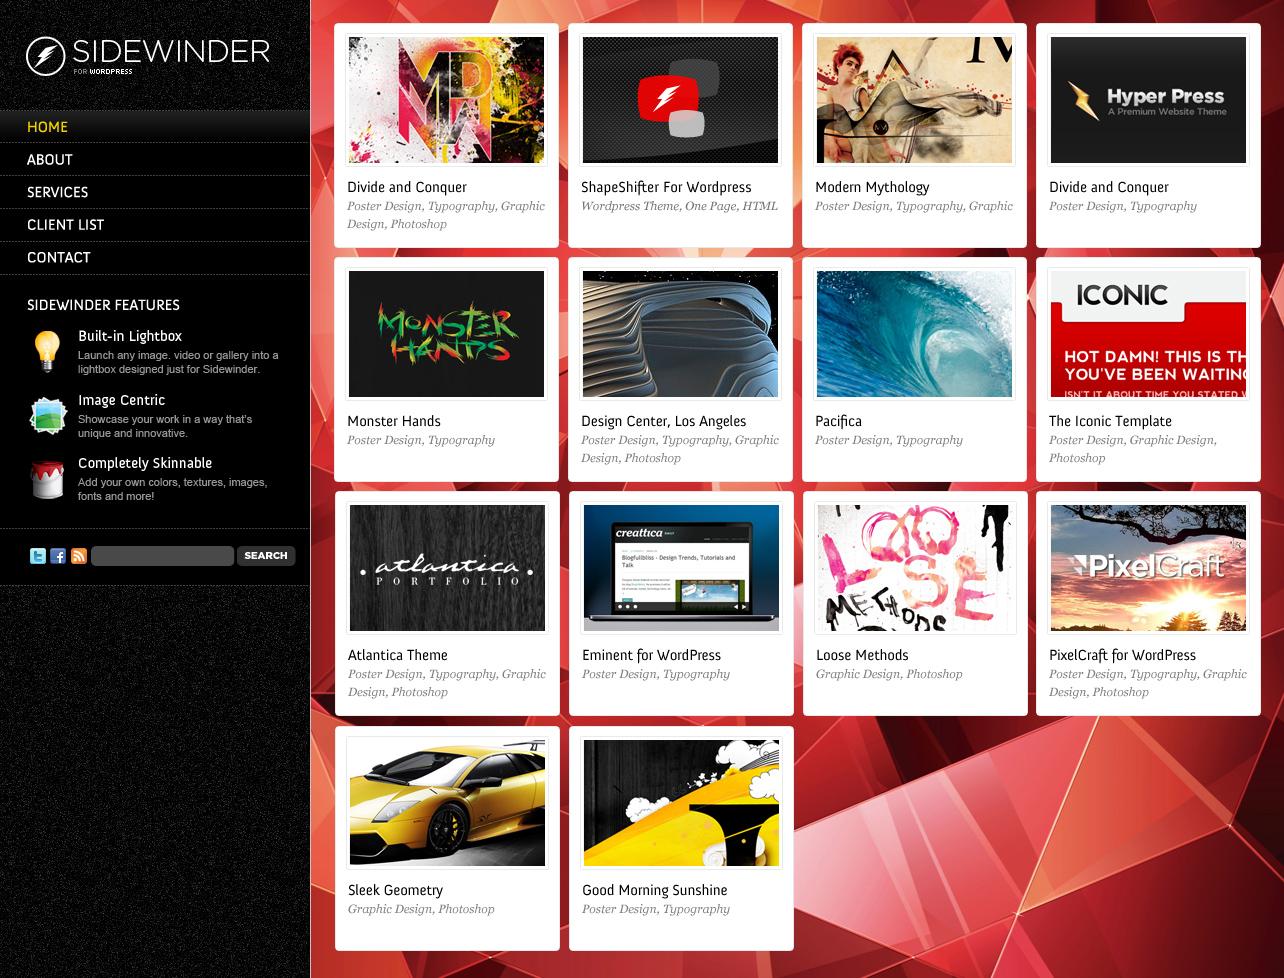 http://3.s3.envato.com/files/1552678/screenshots/00_Sidewinder_preview_wp.jpg%20(3).jpg